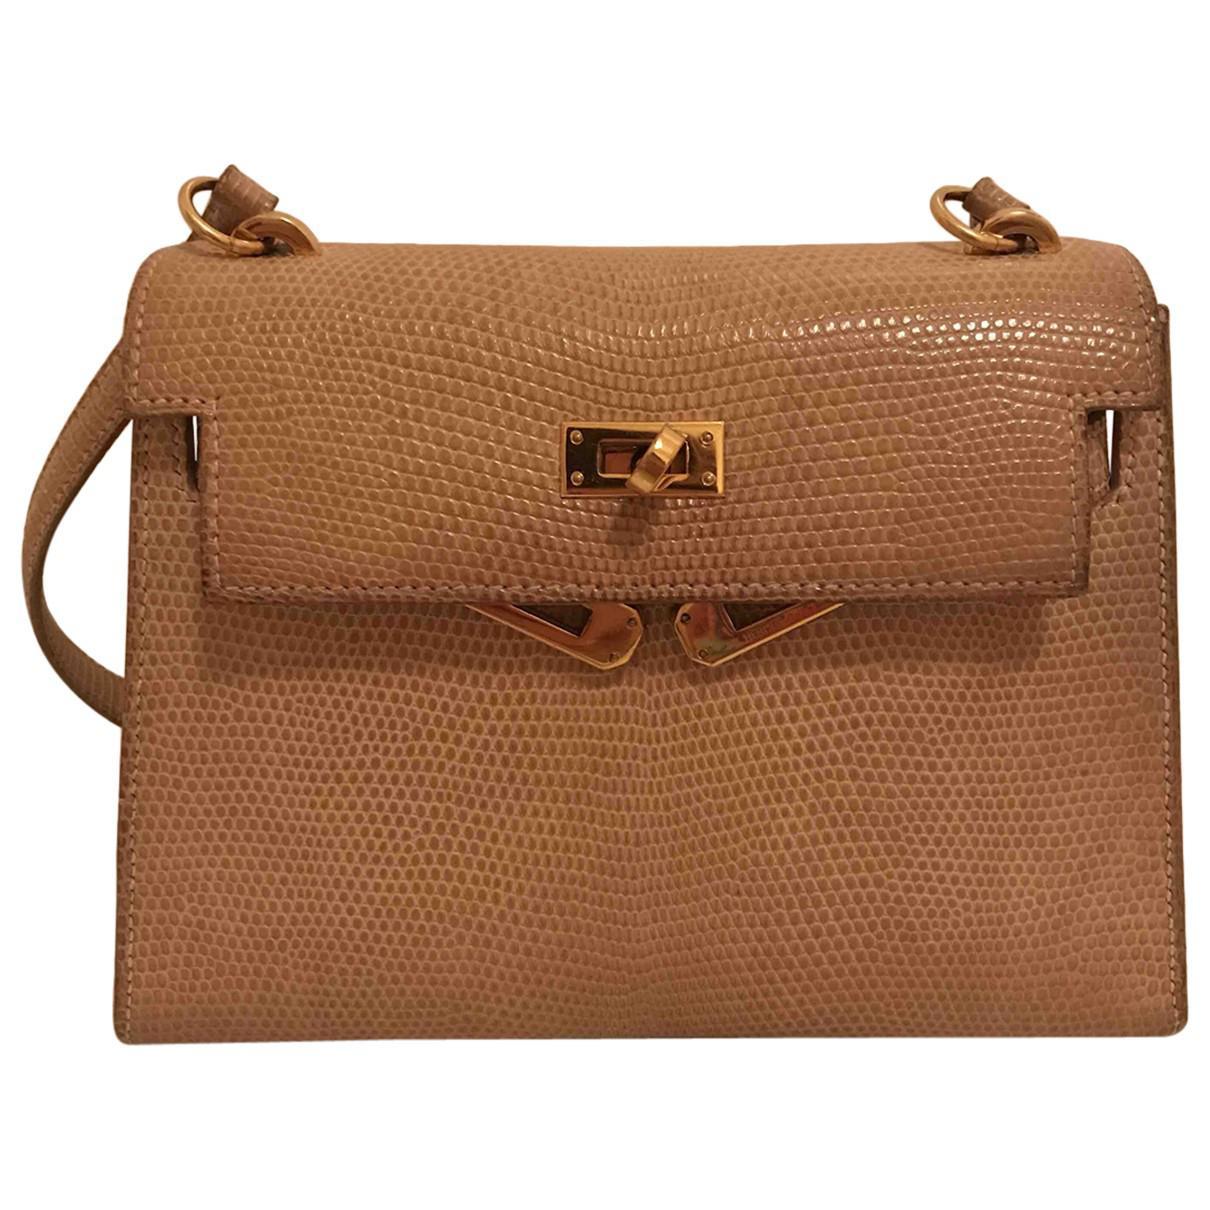 0b781aa772 ... where can i buy lyst hermès pre owned kelly mini lizard bag in natural  66c00 9f850